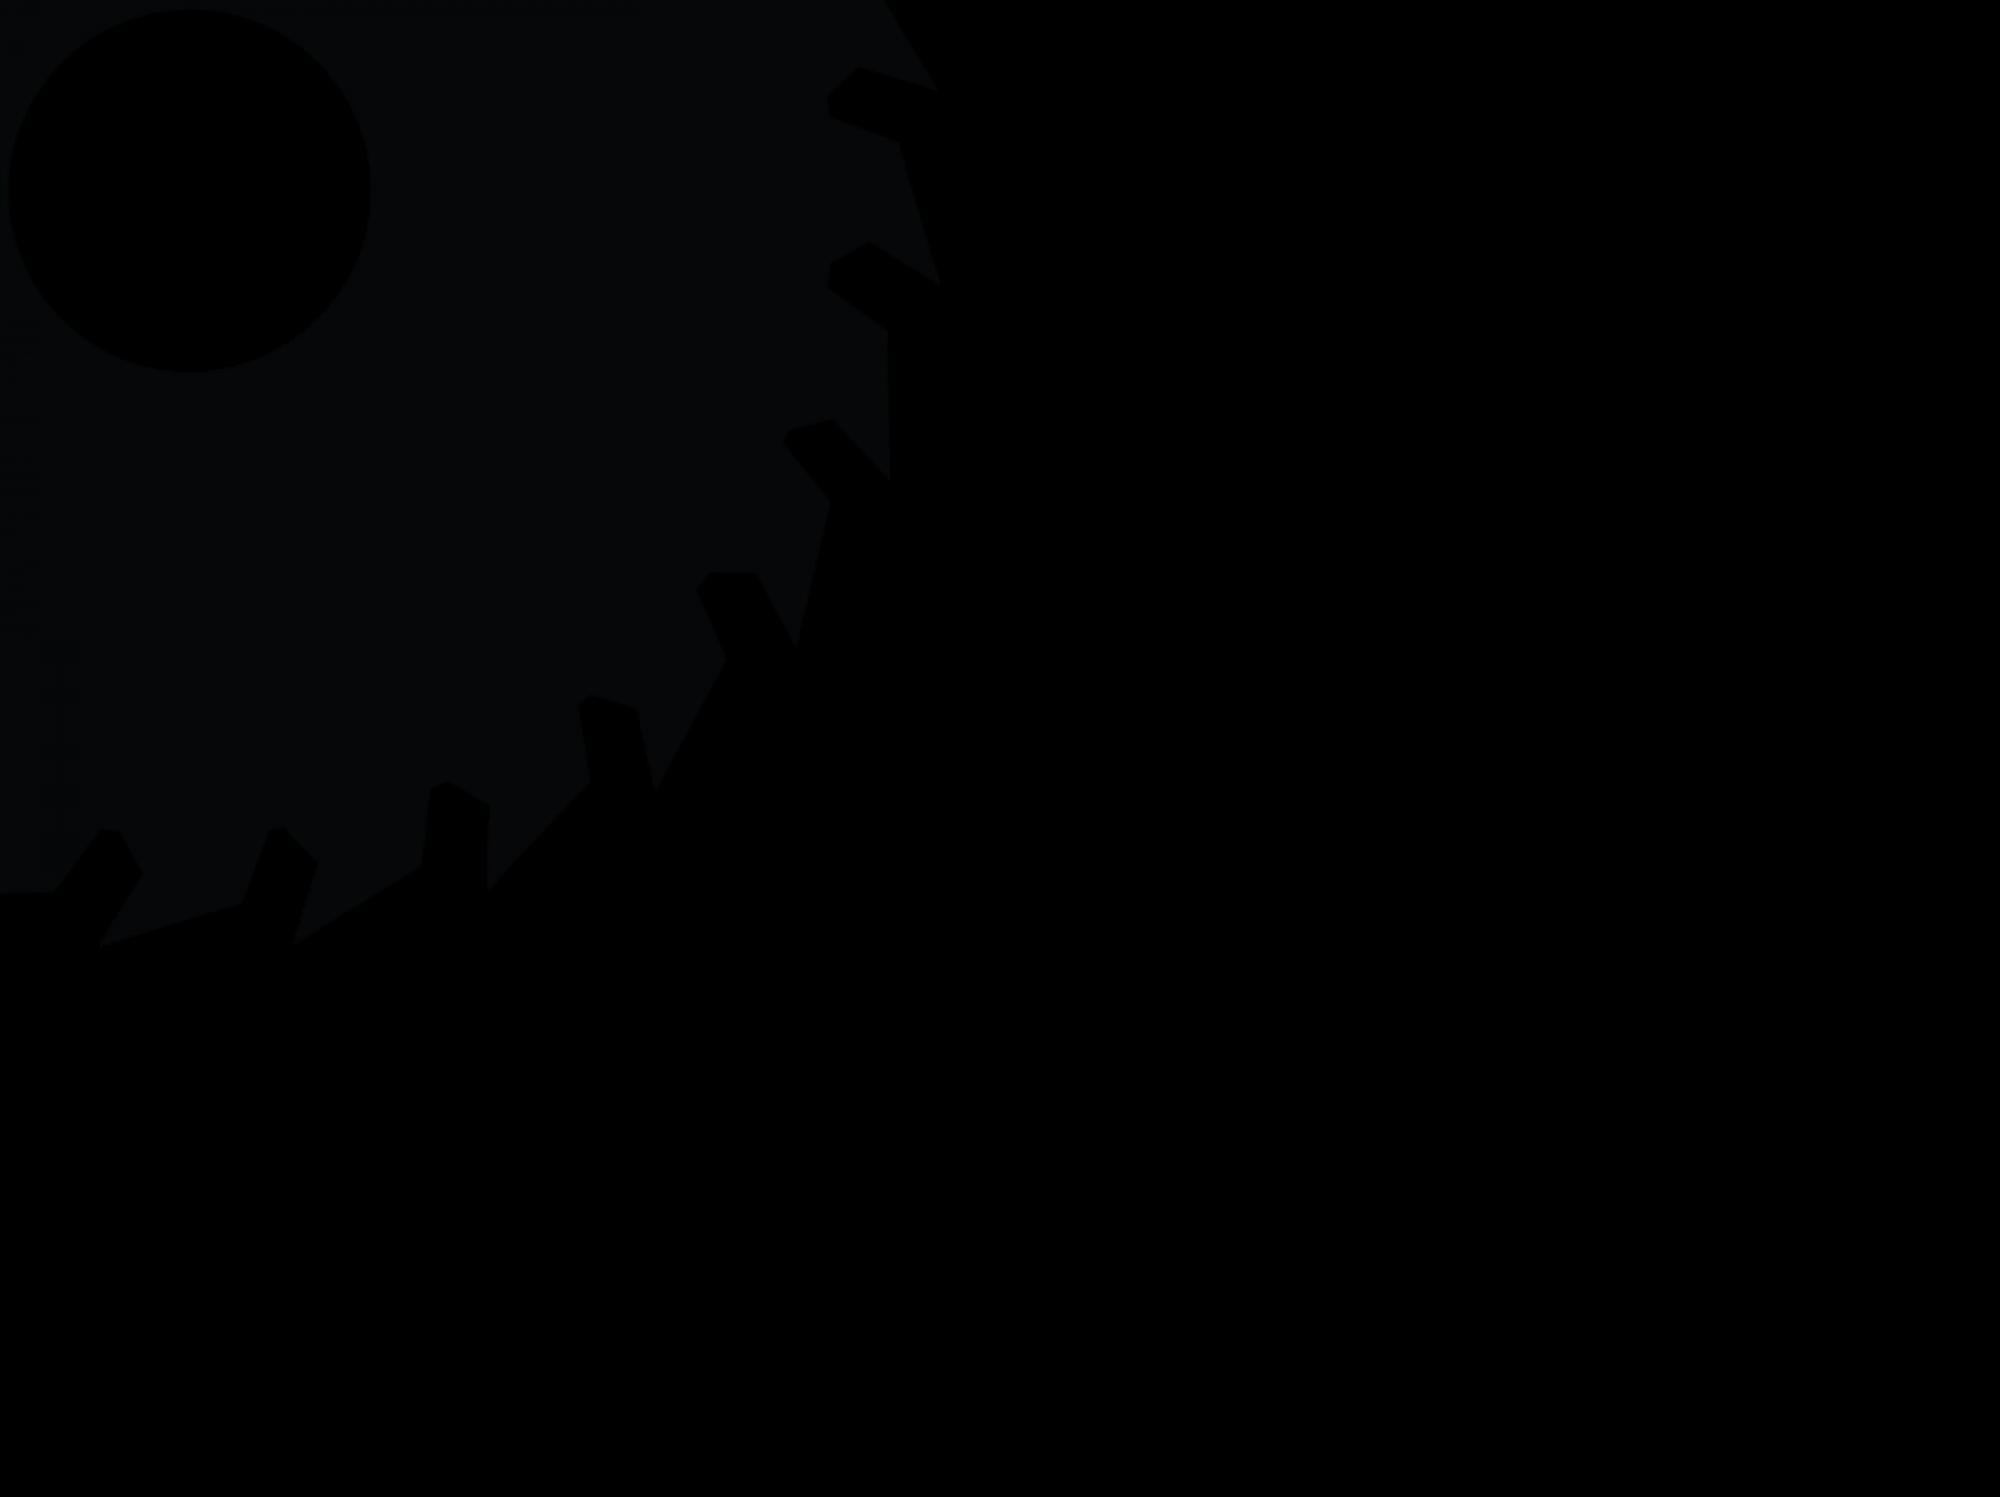 MKL Tools (new website coming soon)